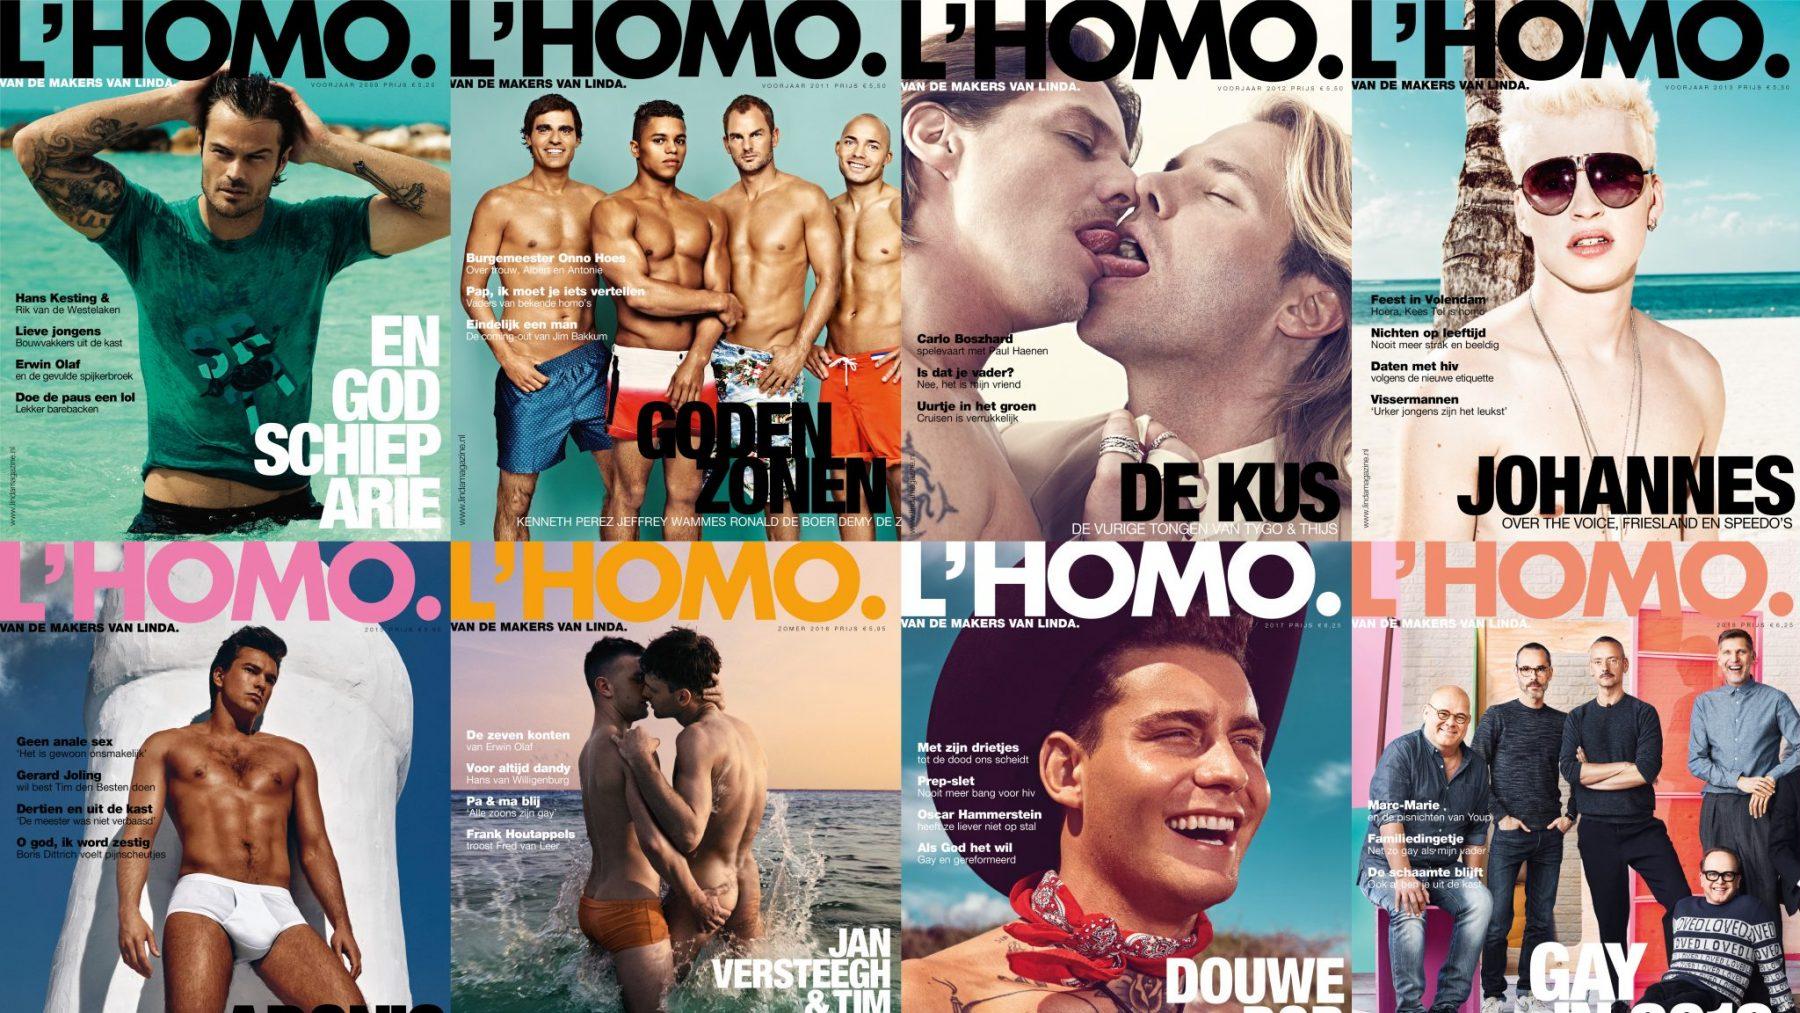 L'HOMO. stopt